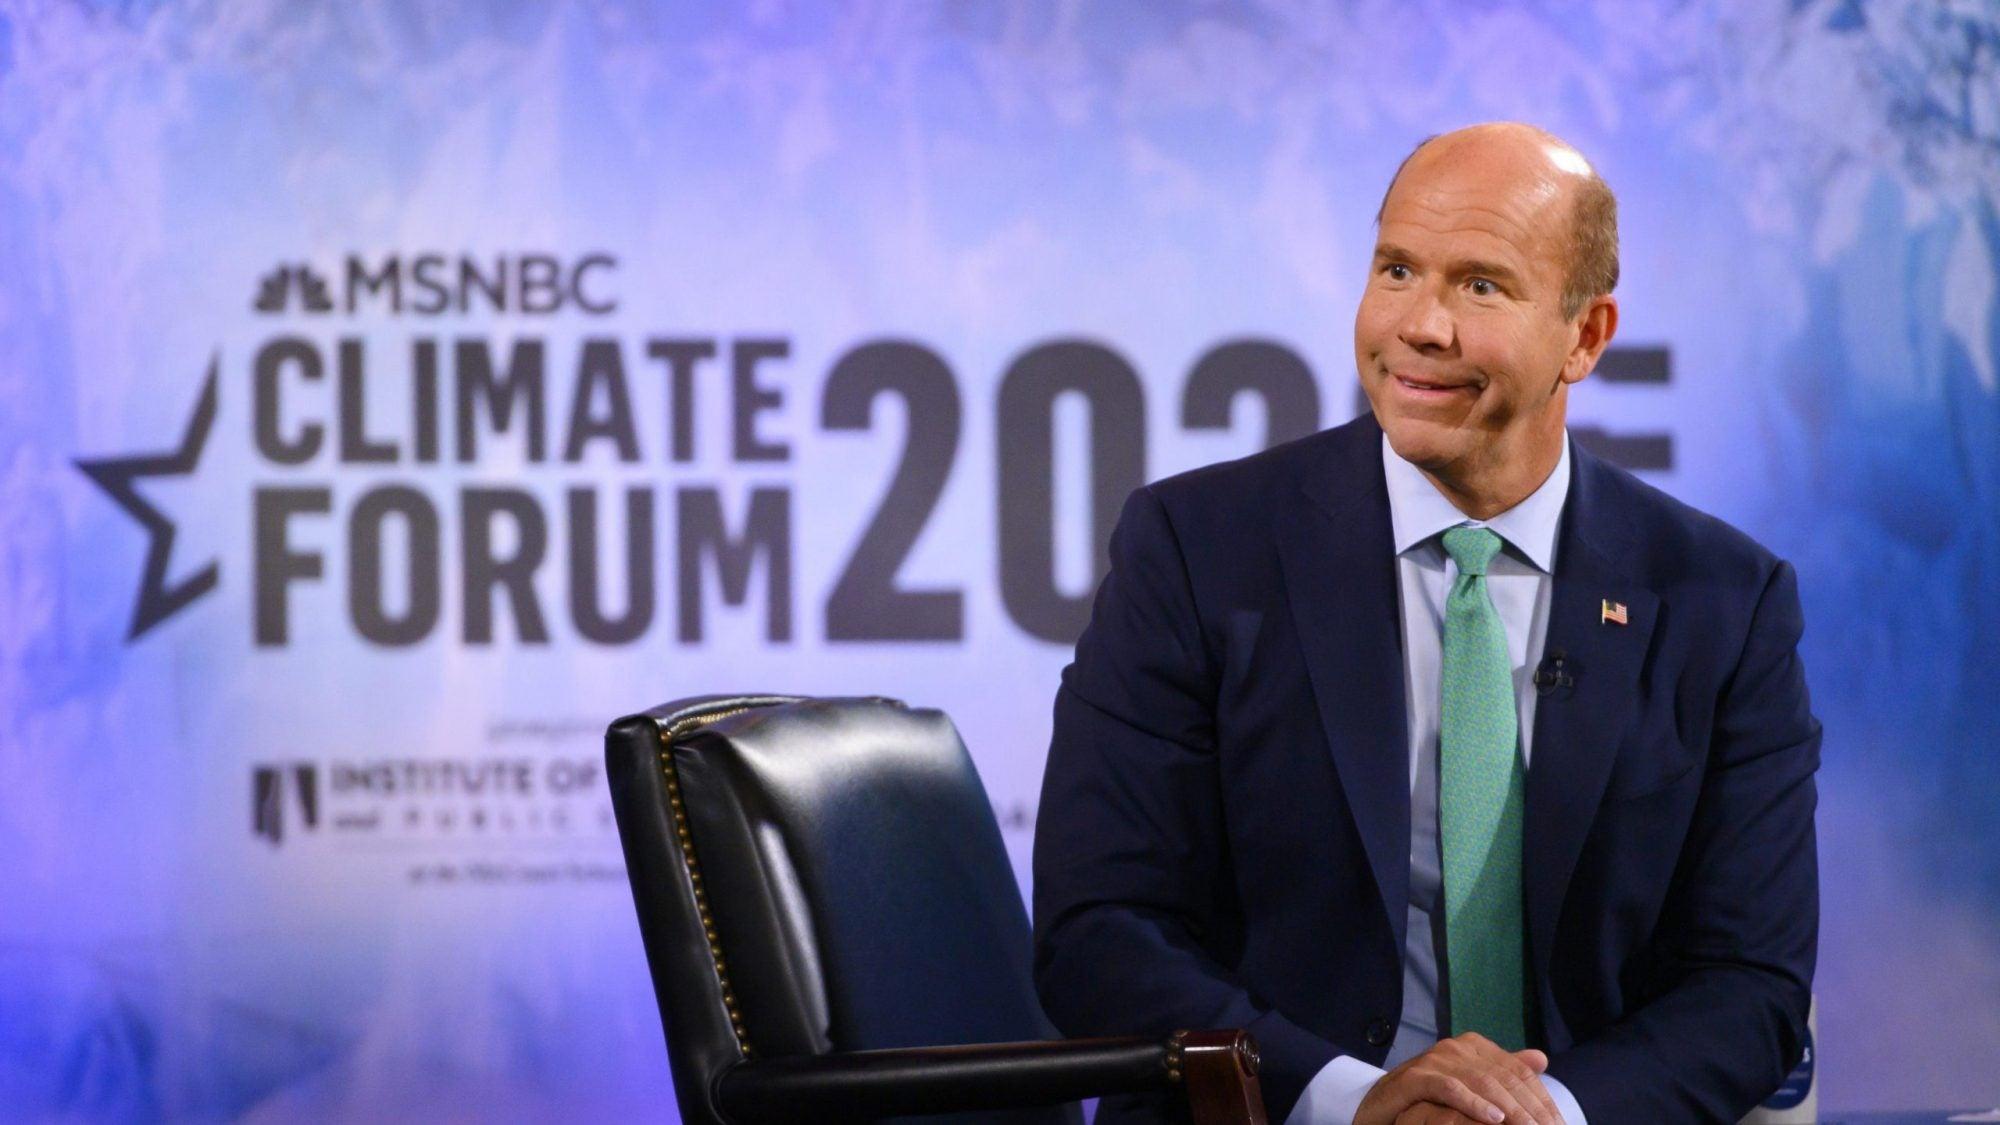 Climate Forum - John Delaney